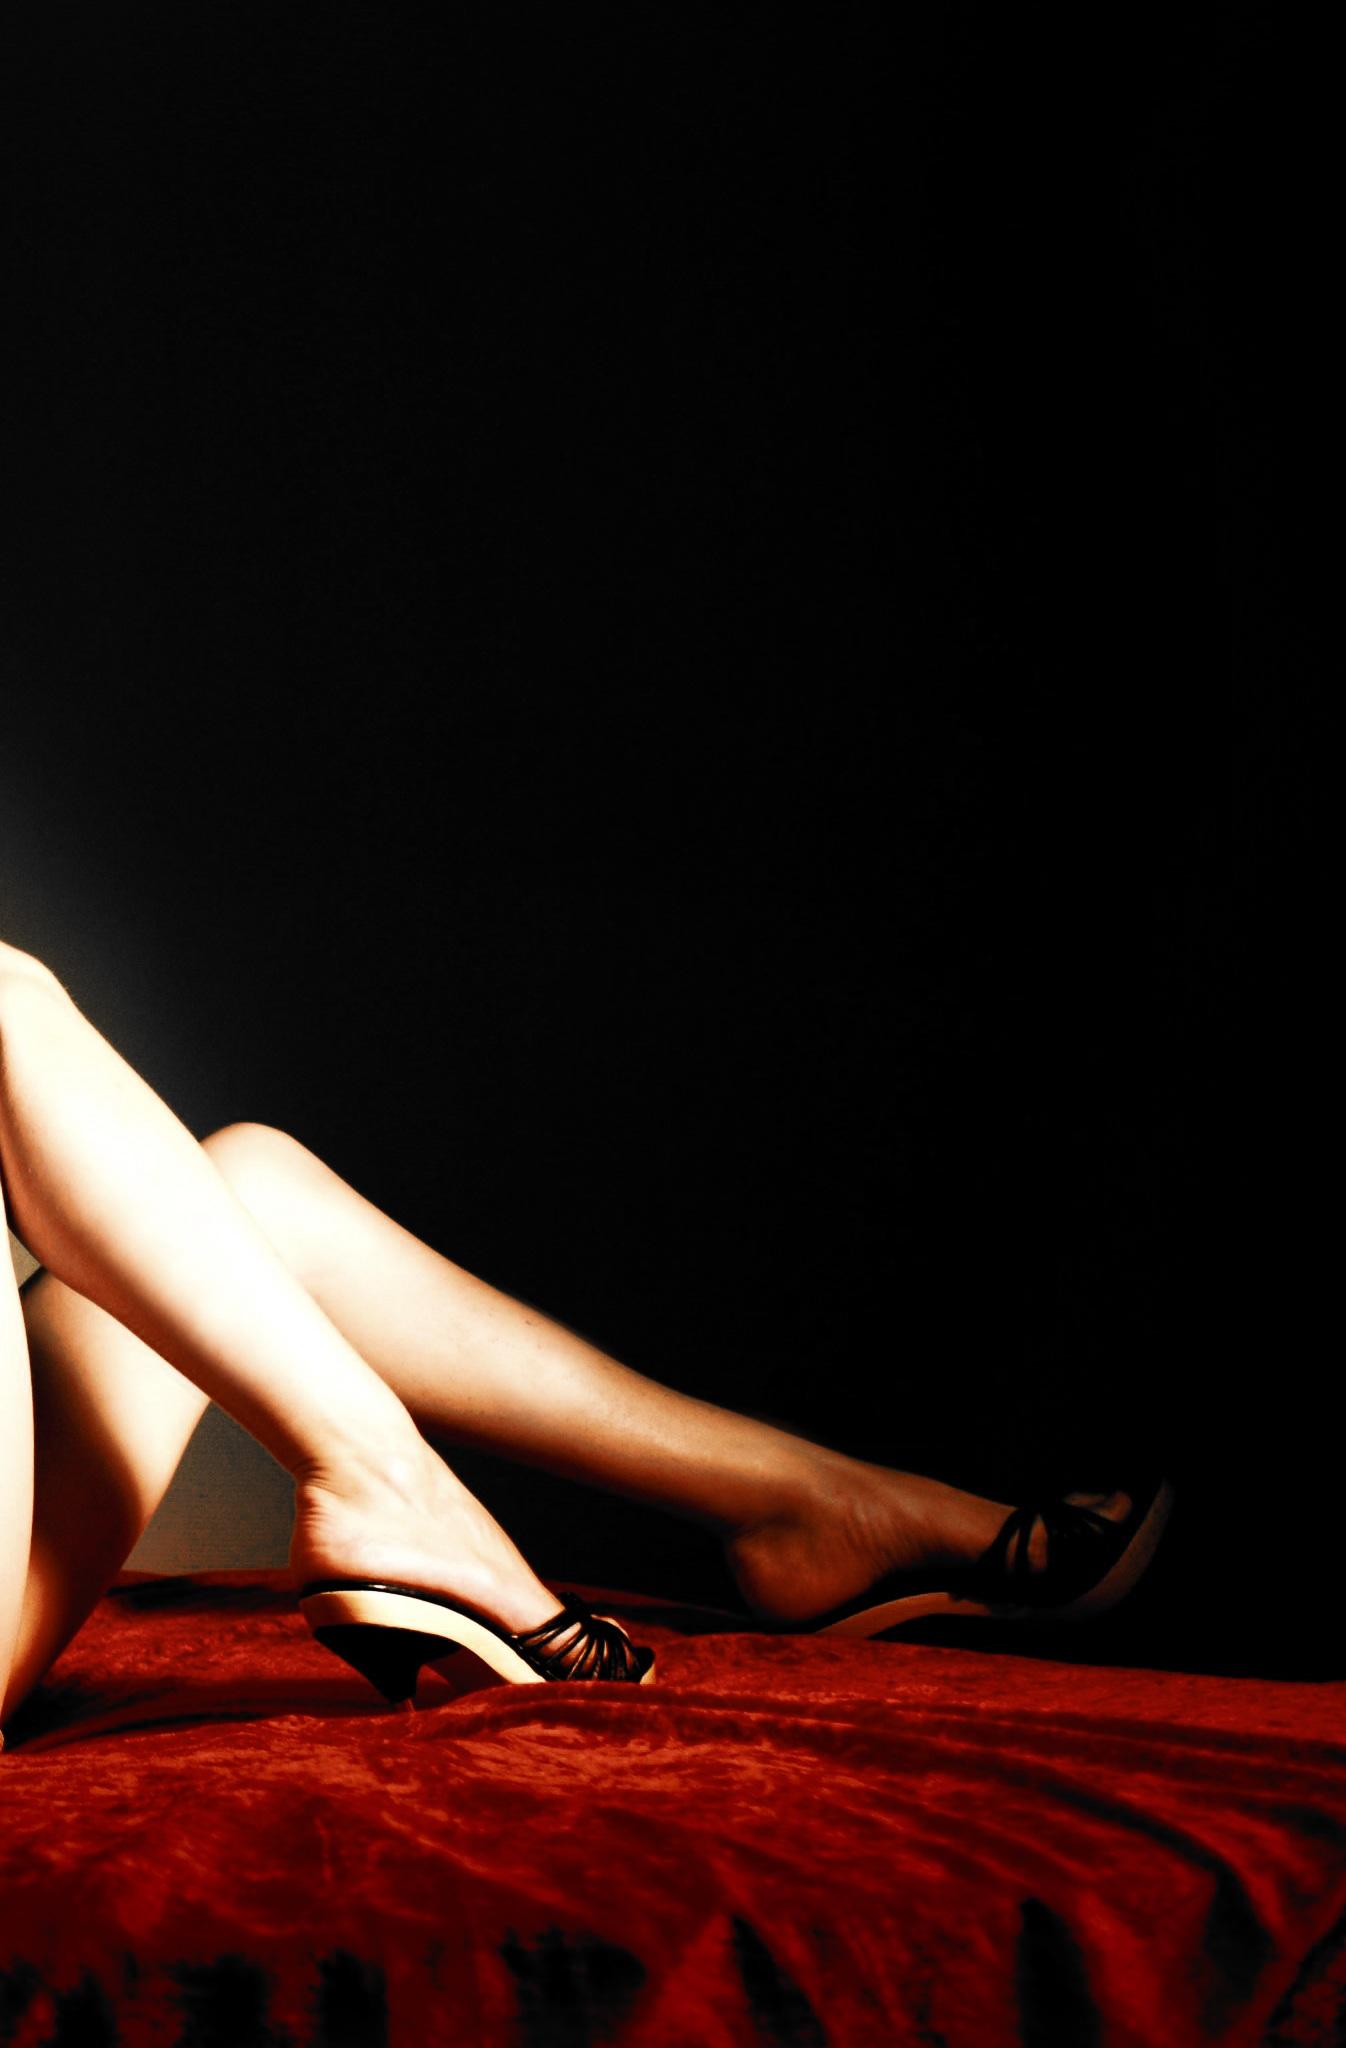 Free stock photo of body dessous erotic